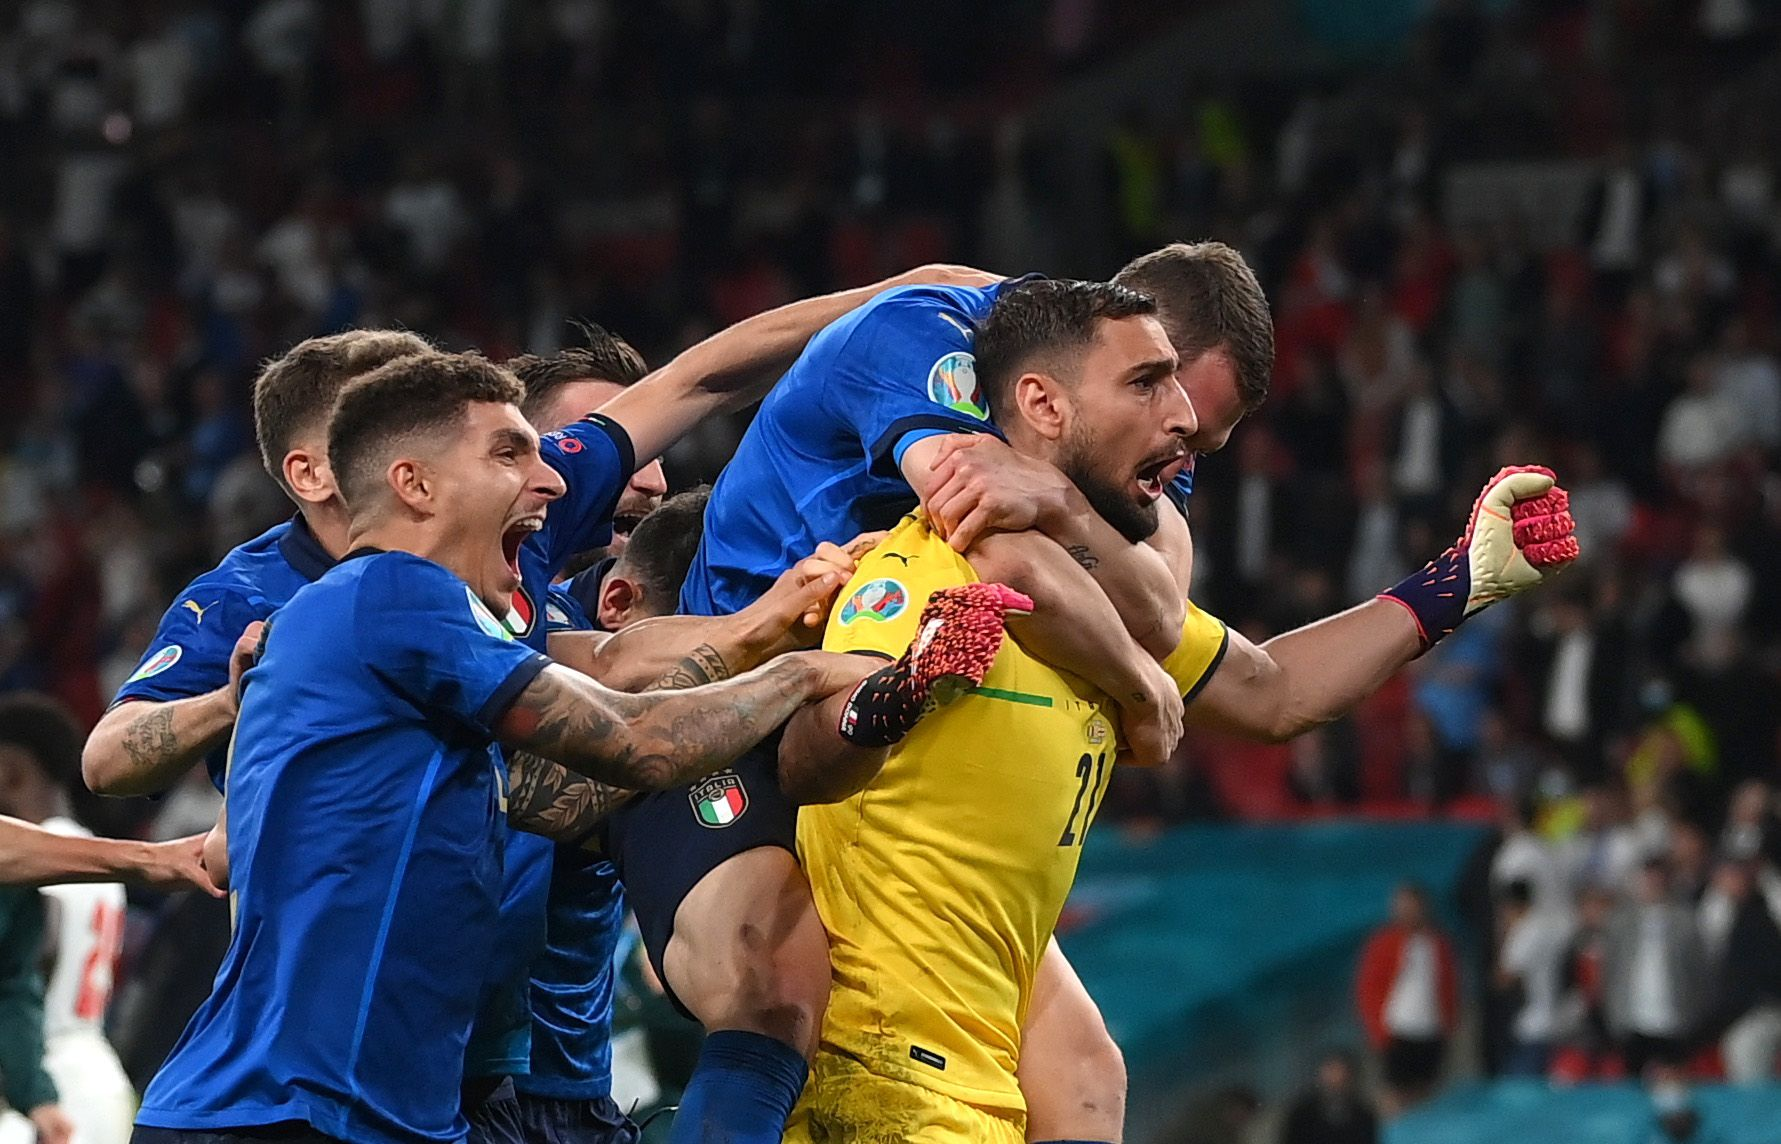 Soccer Football - Euro 2020 - Final - Italy v England - Wembley Stadium, London, Britain - July 11, 2021 Italy's Federico Bernardeschi scores a penalty during a penalty shootout. Pool via Reuters